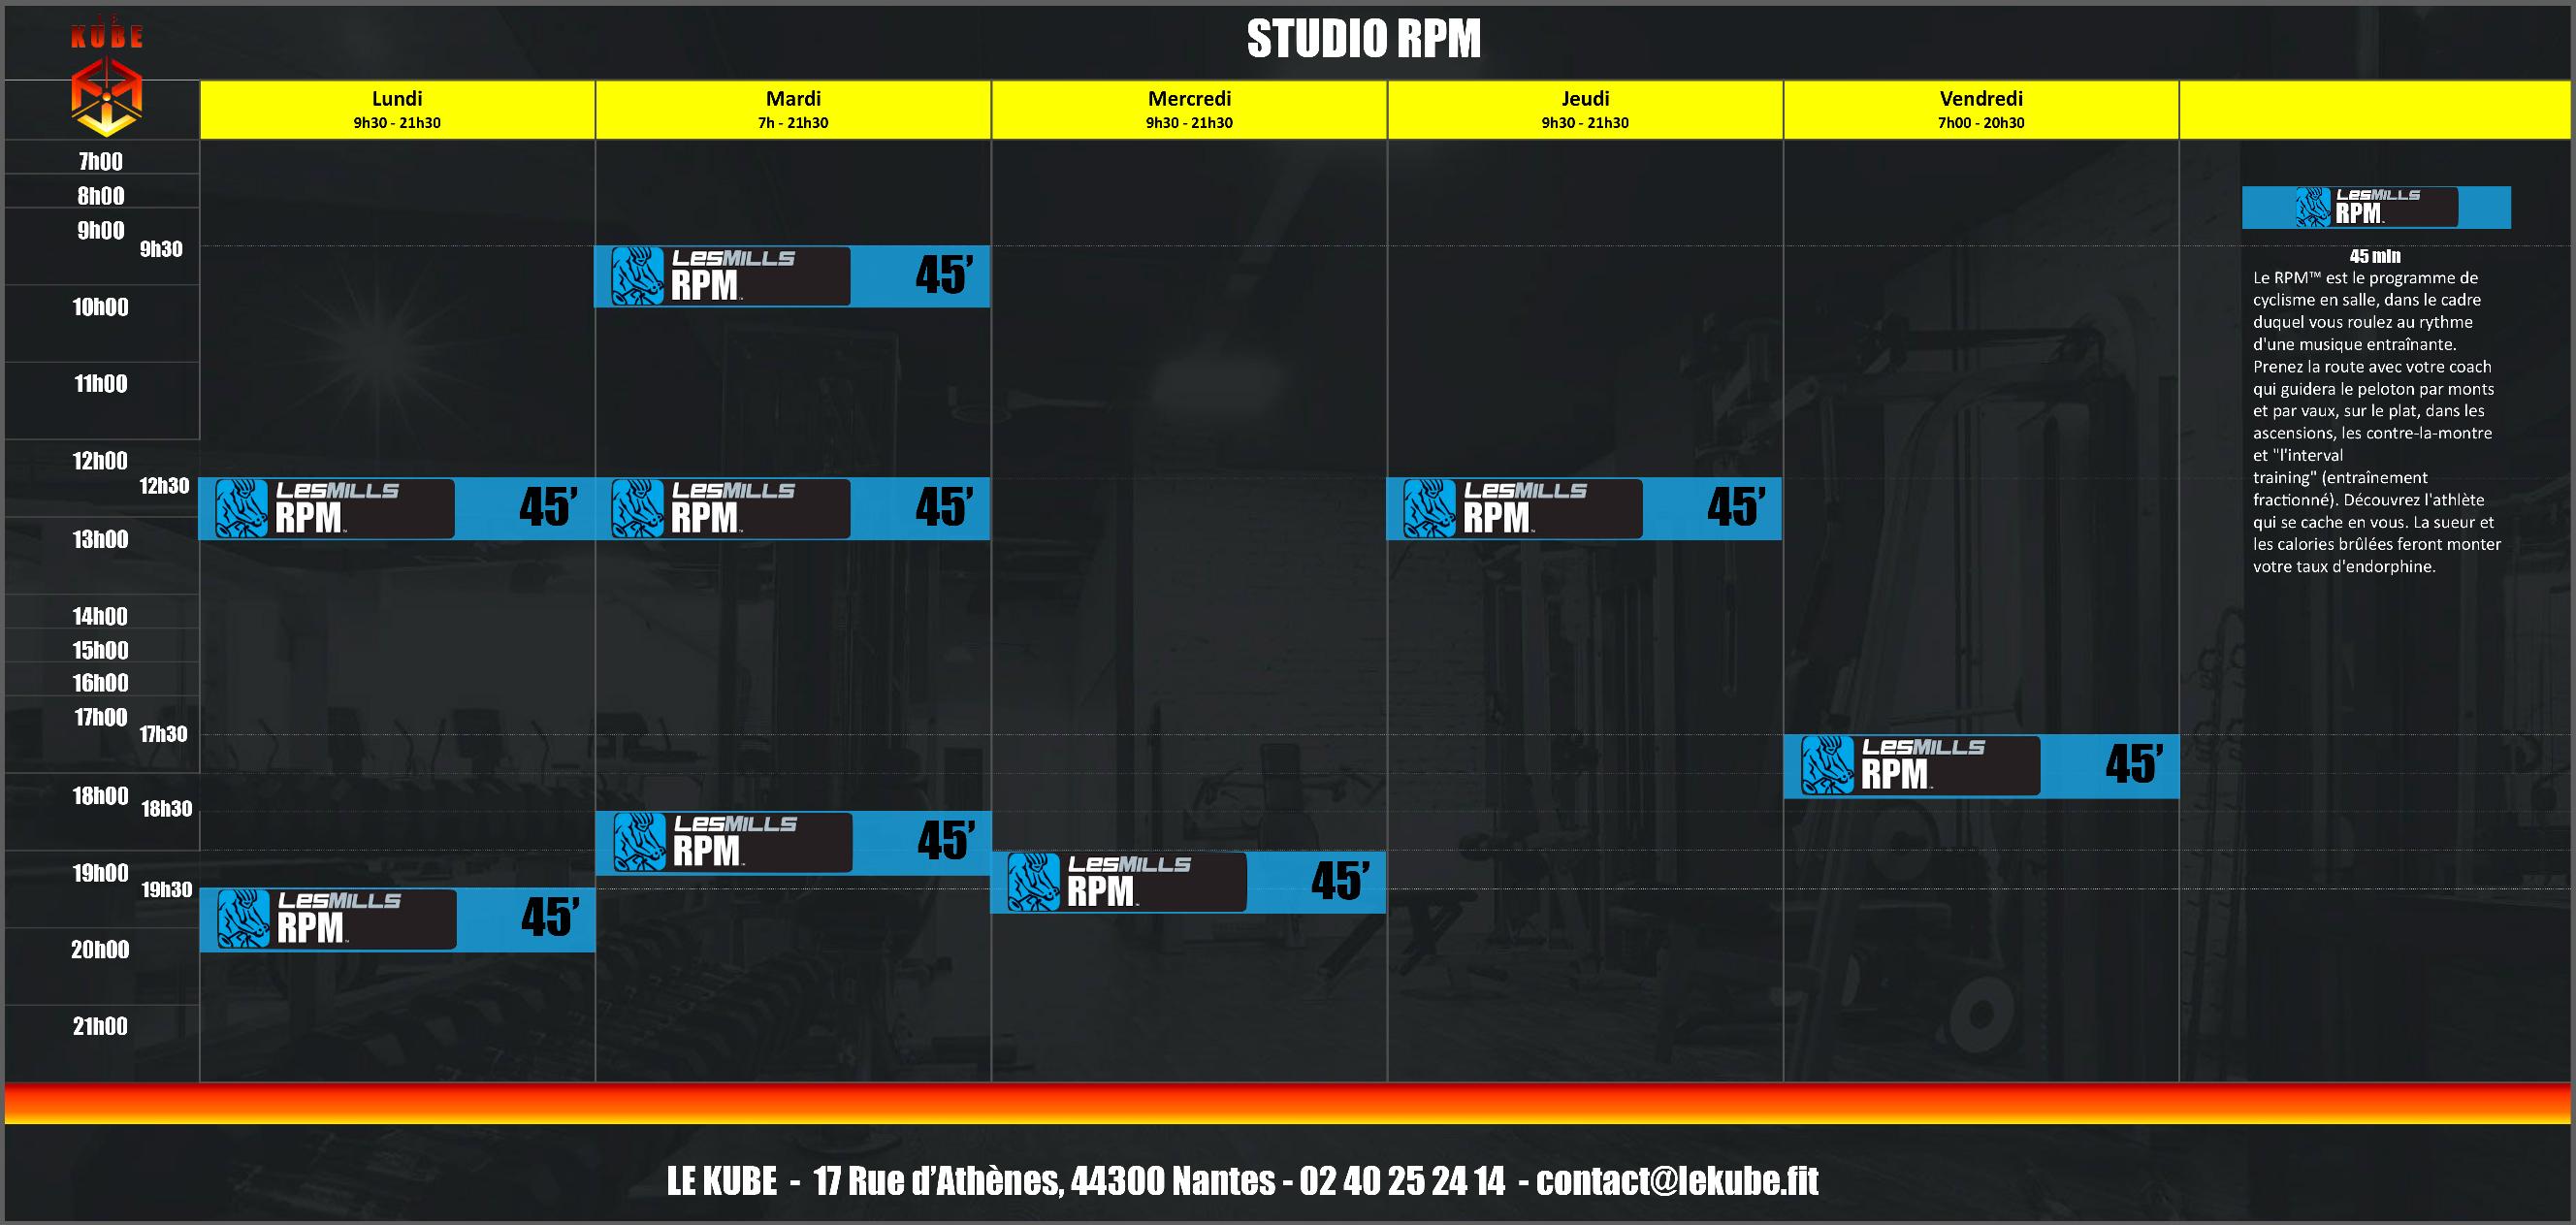 Planning-Studio-RPM-l